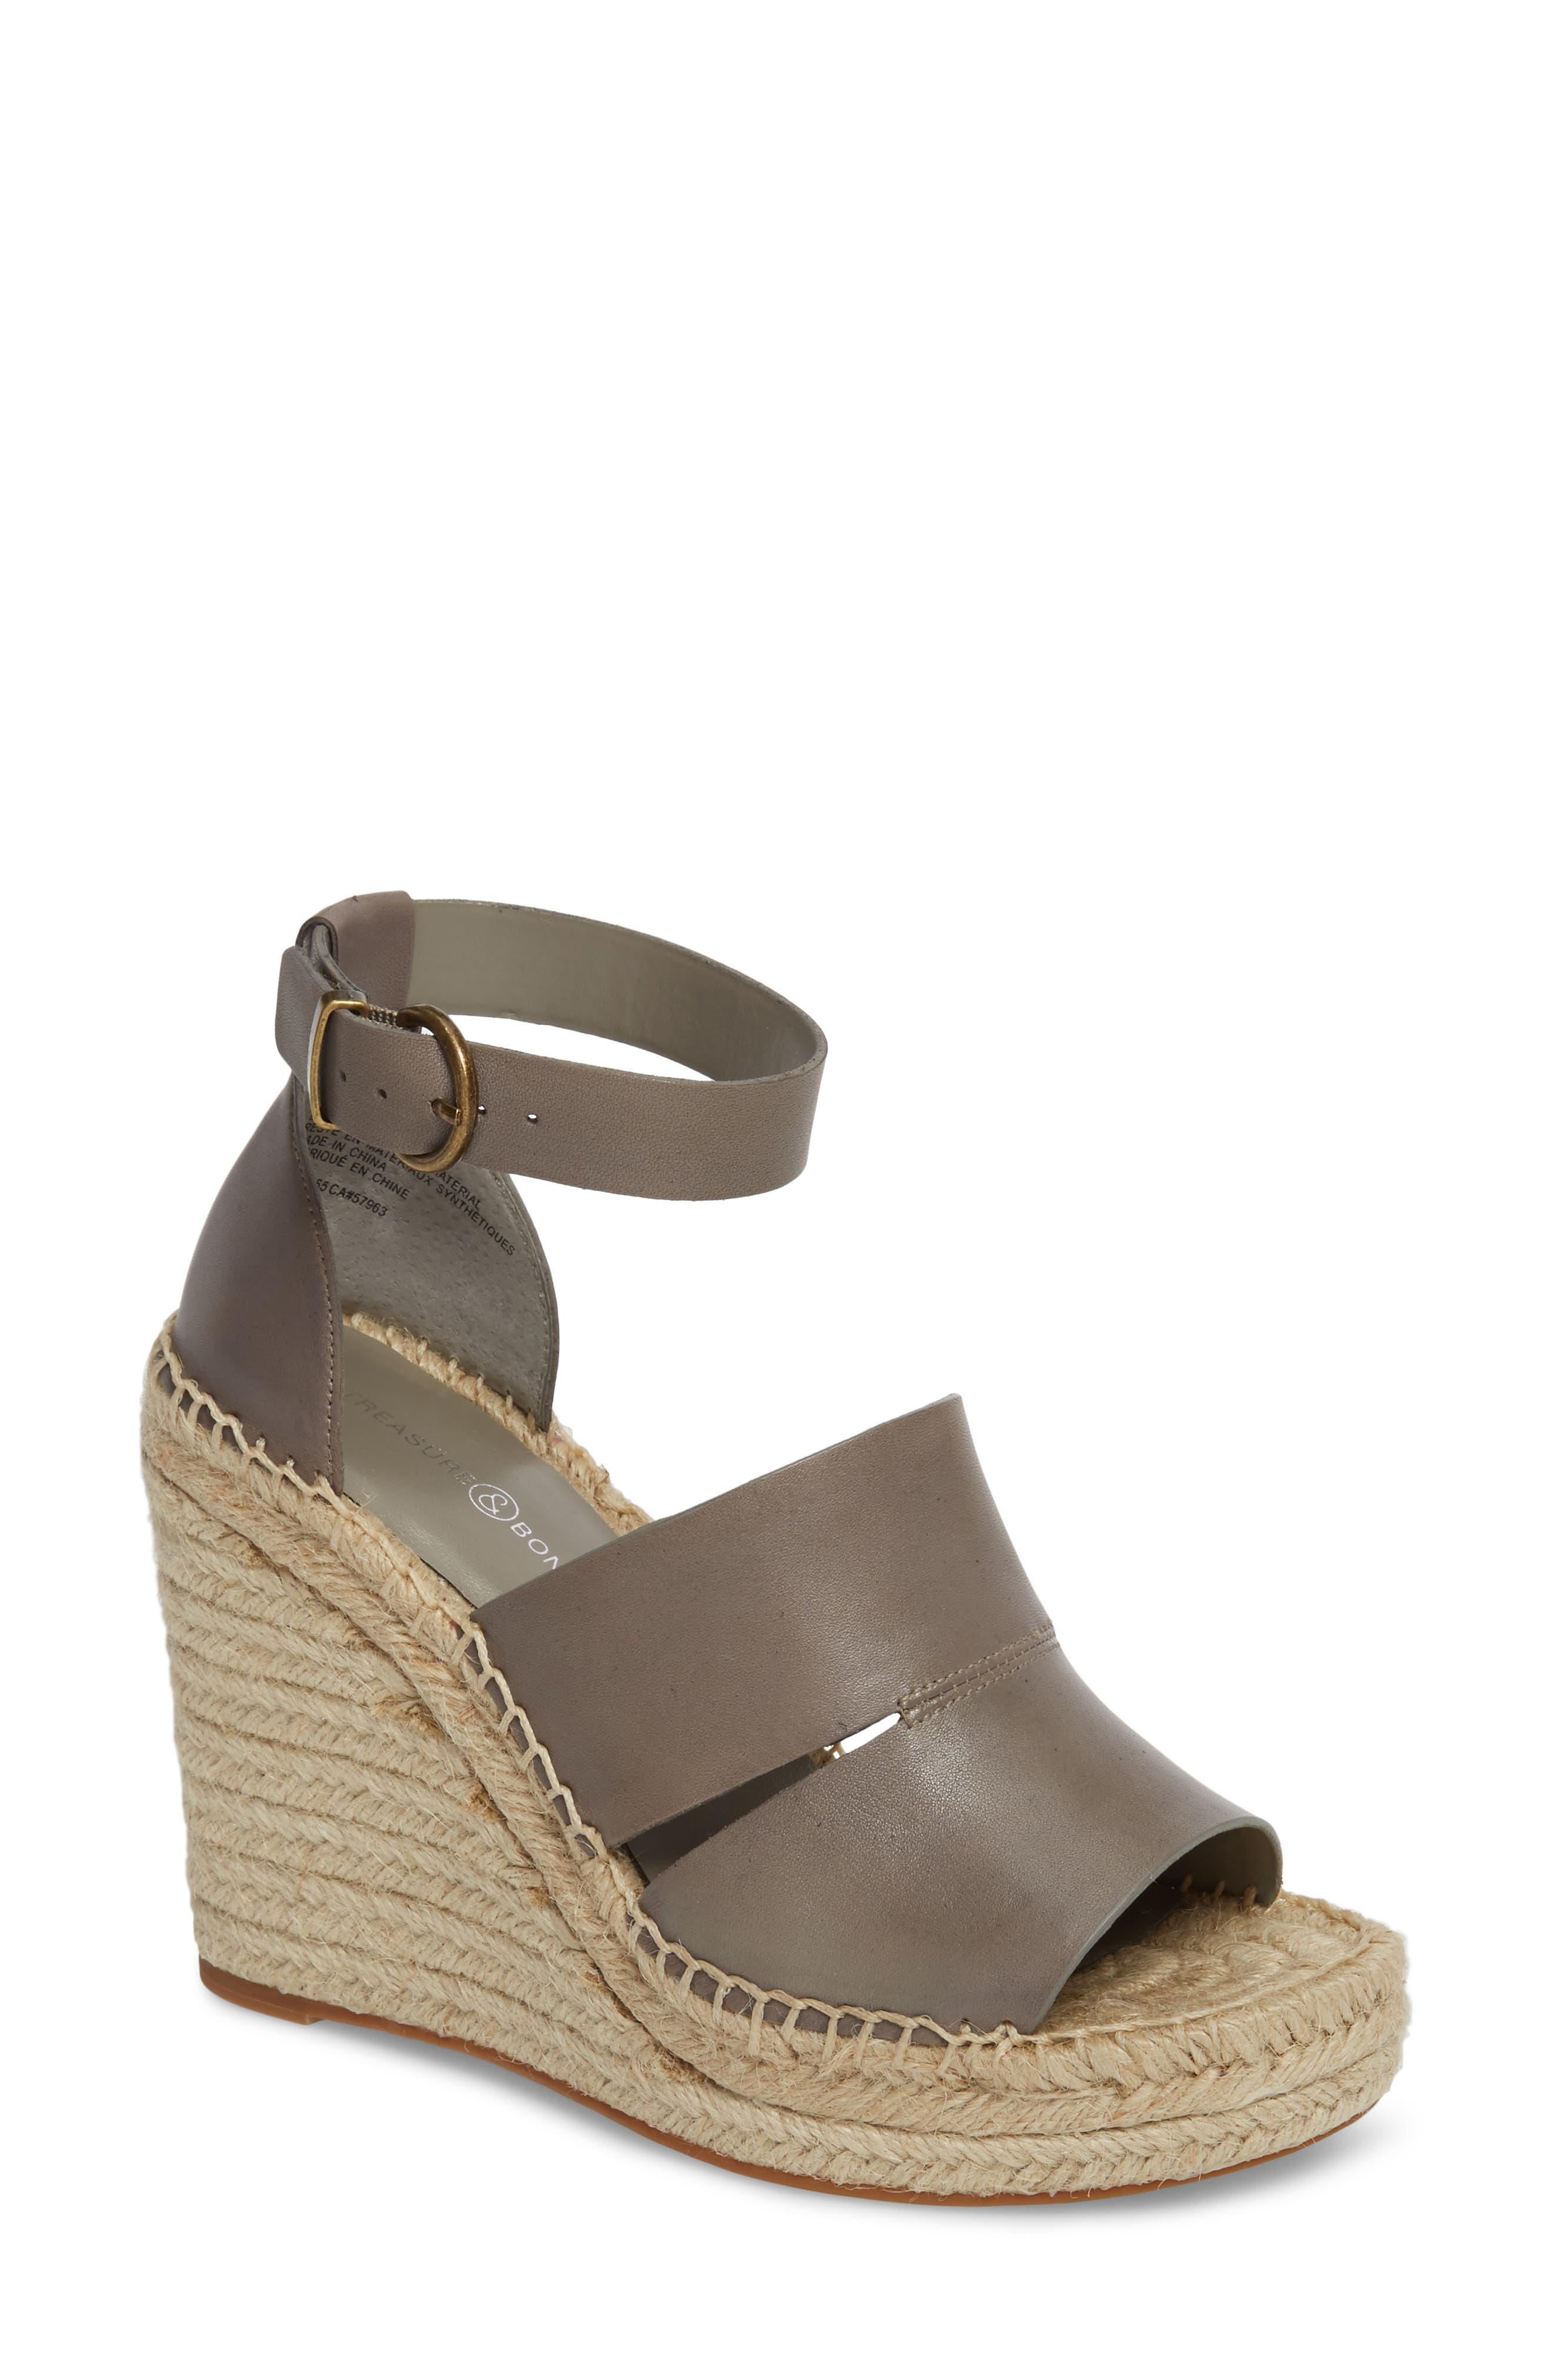 TREASURE & BOND Sannibel Platform Wedge Sandal, Main, color, GREY LEATHER